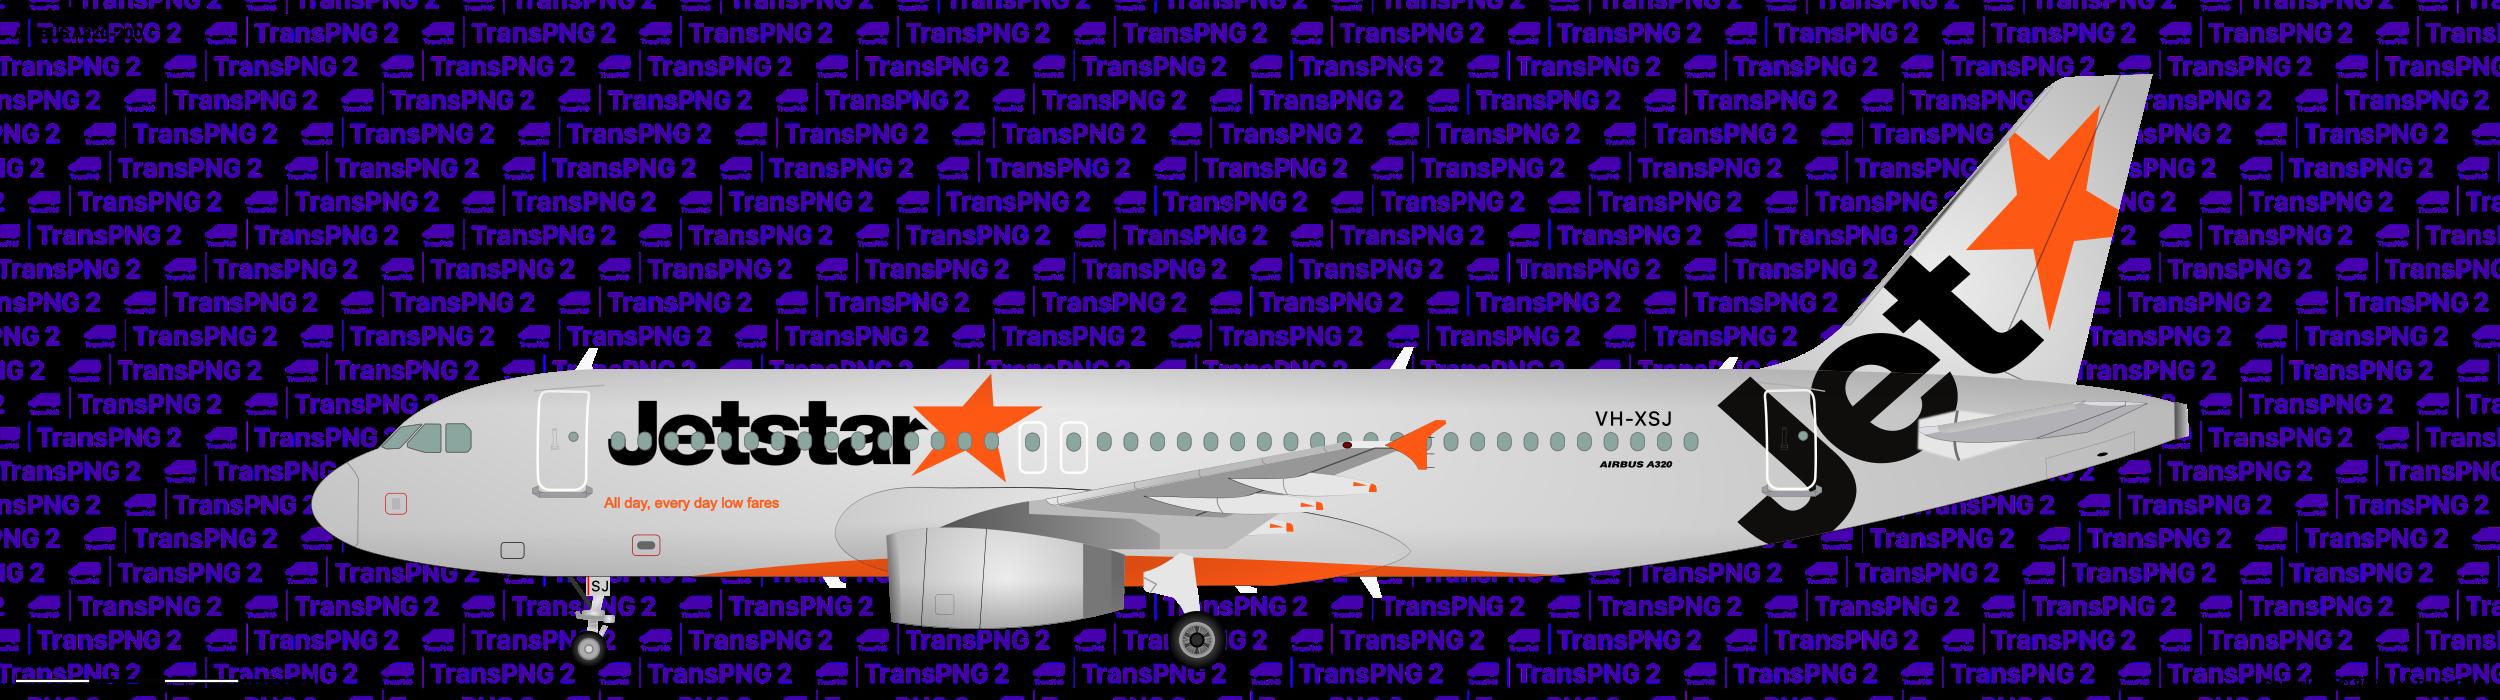 Airplane 25111